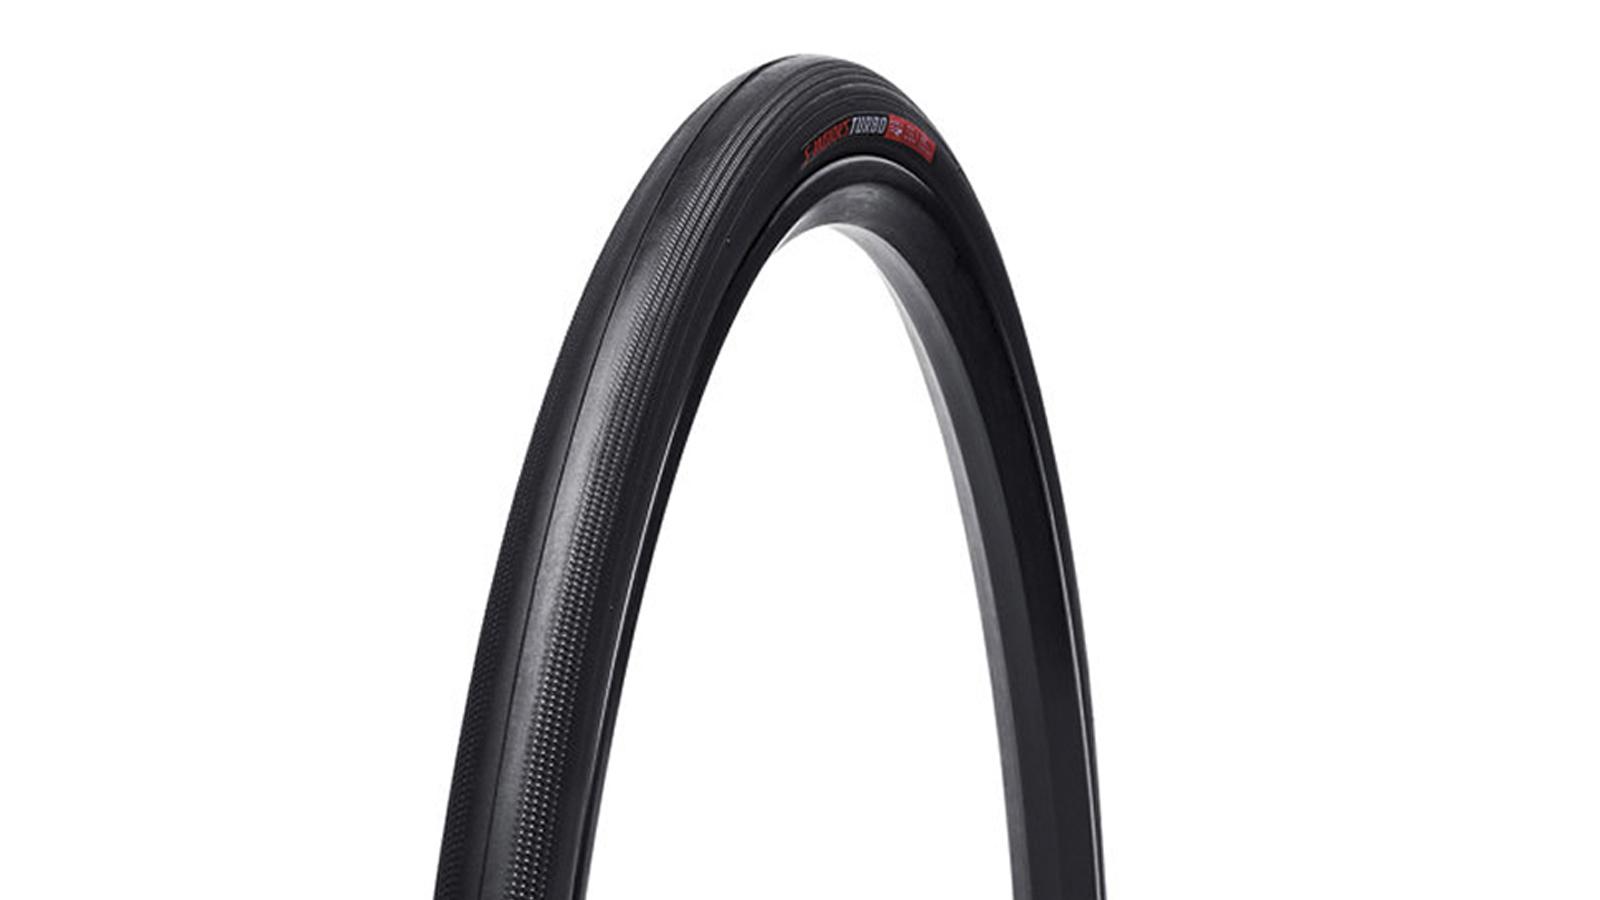 Best Road bike tyres: Specialized S-Works Turbo RapidAir